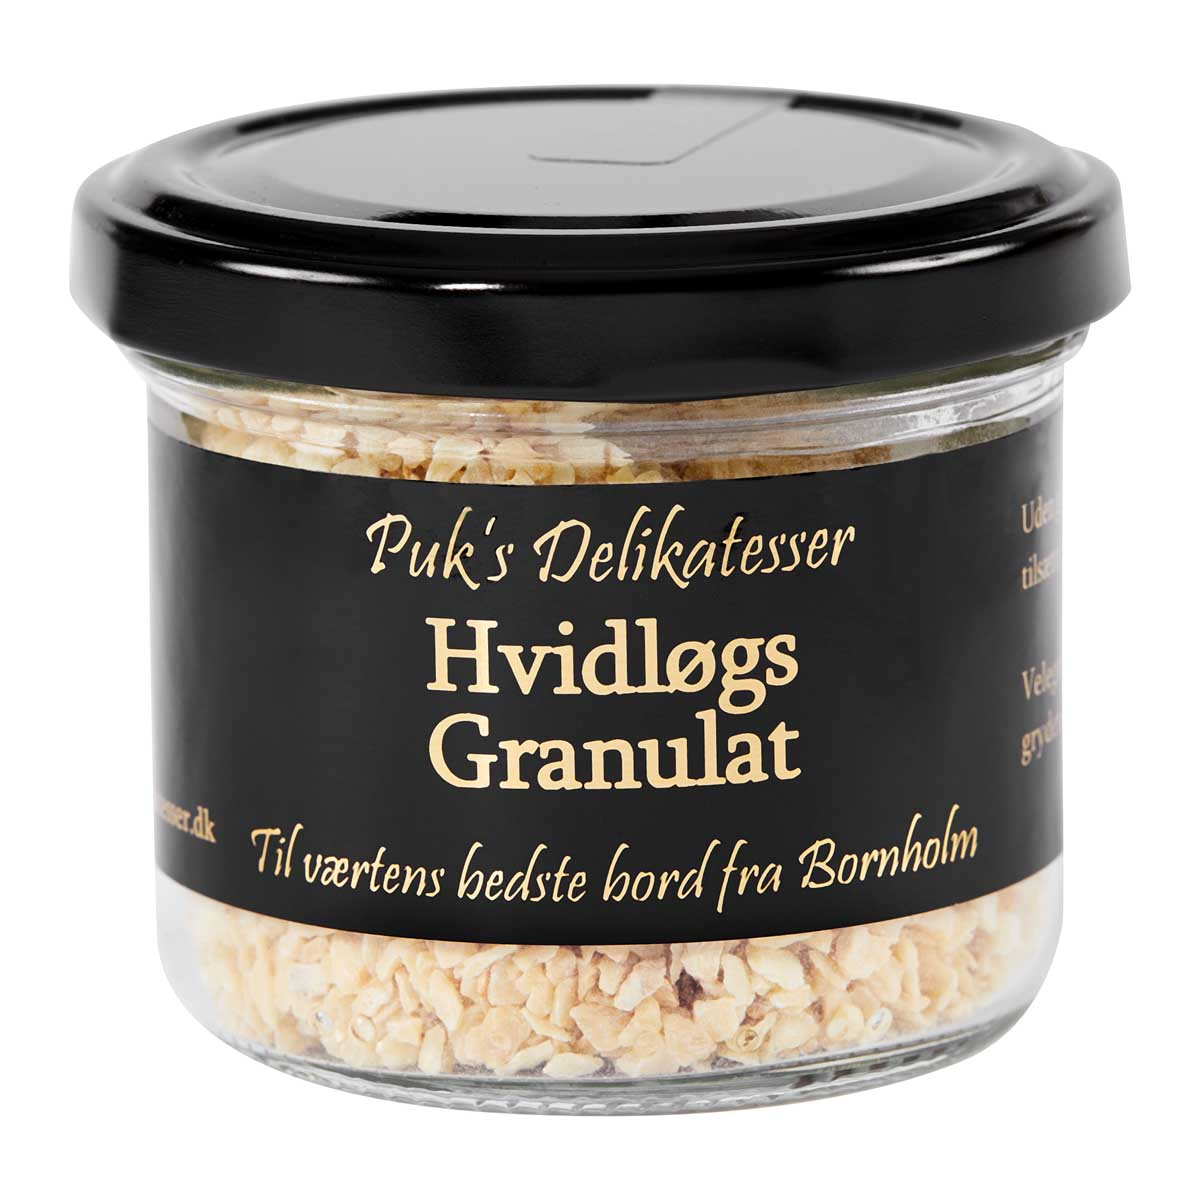 Hvidløgs Granulat